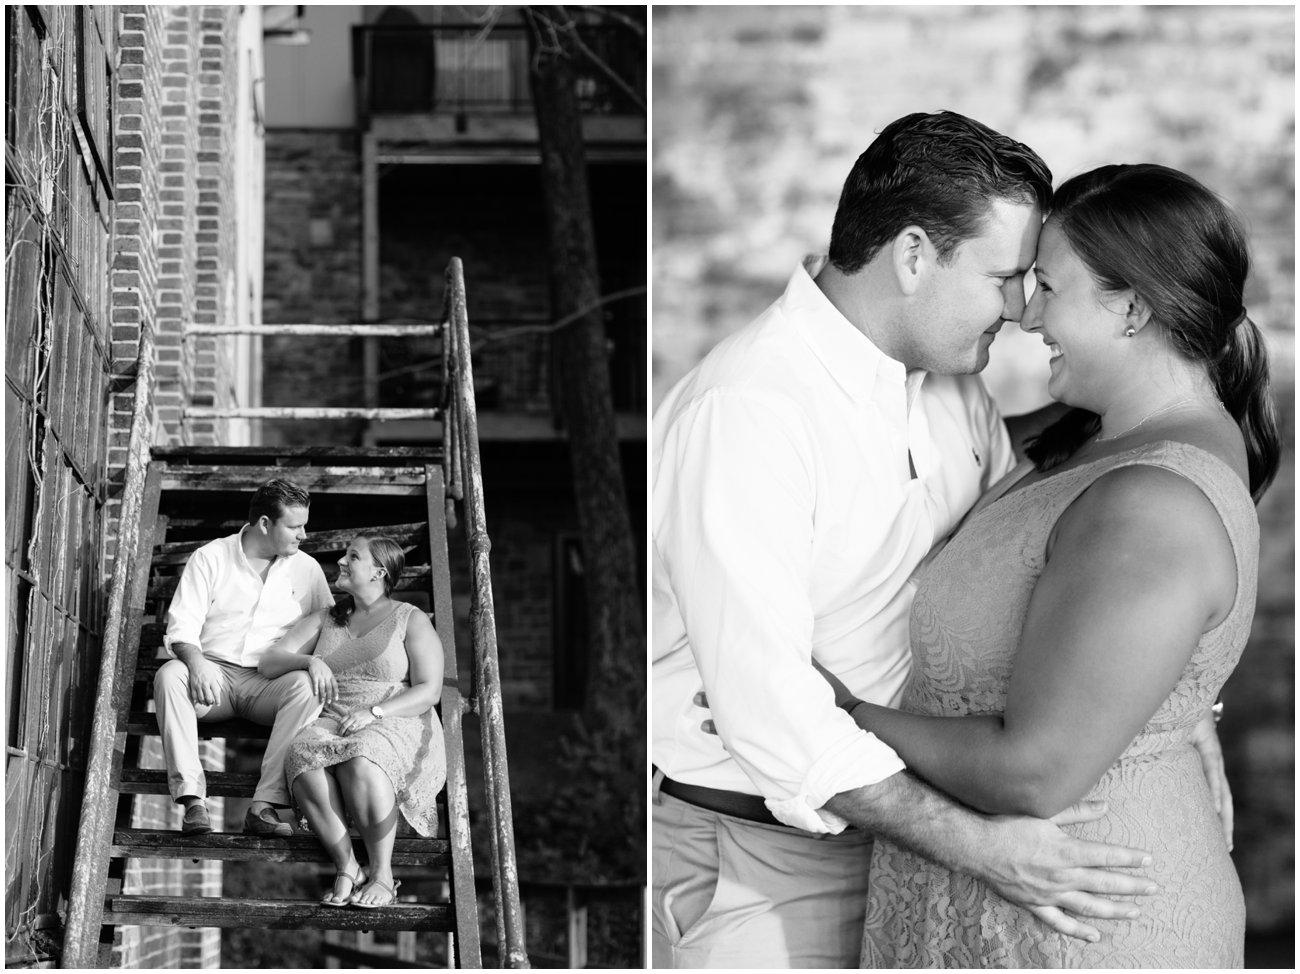 Gina_Alex_Clipper_Mill_Engagement_baltimore_Wedding_photographer_0002